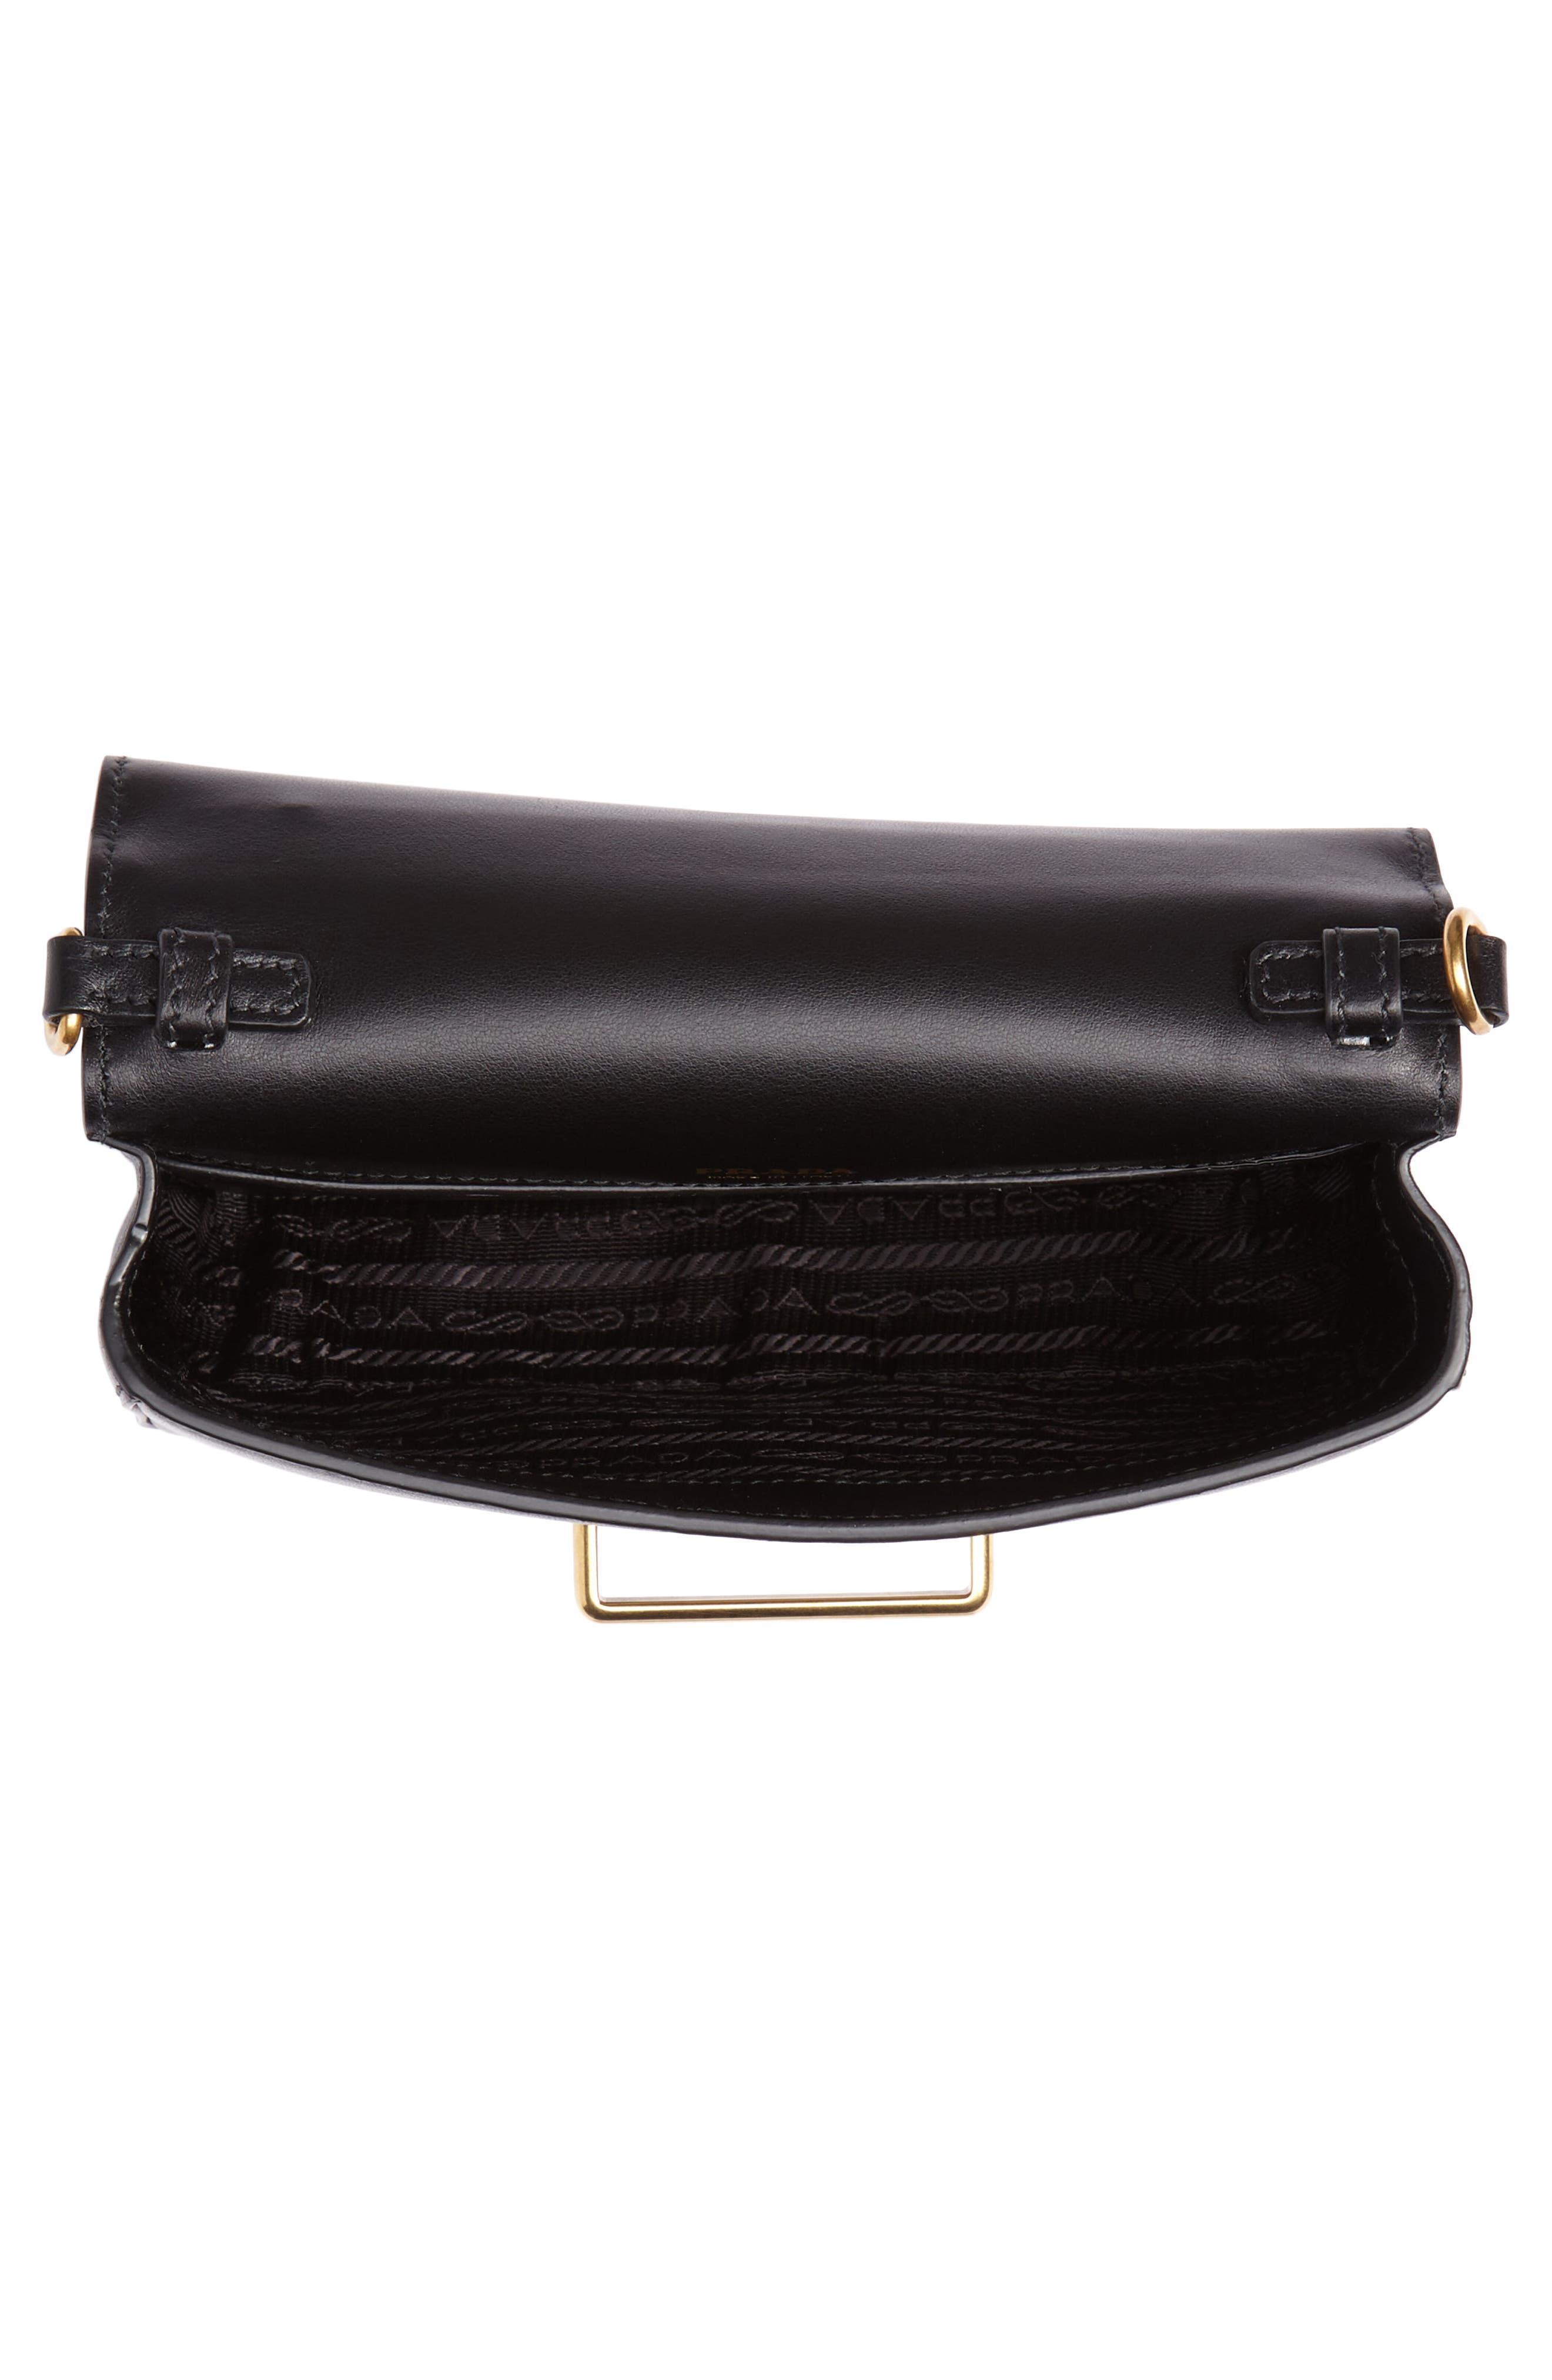 PRADA,                             Cahier Leather Belt Bag,                             Alternate thumbnail 5, color,                             001